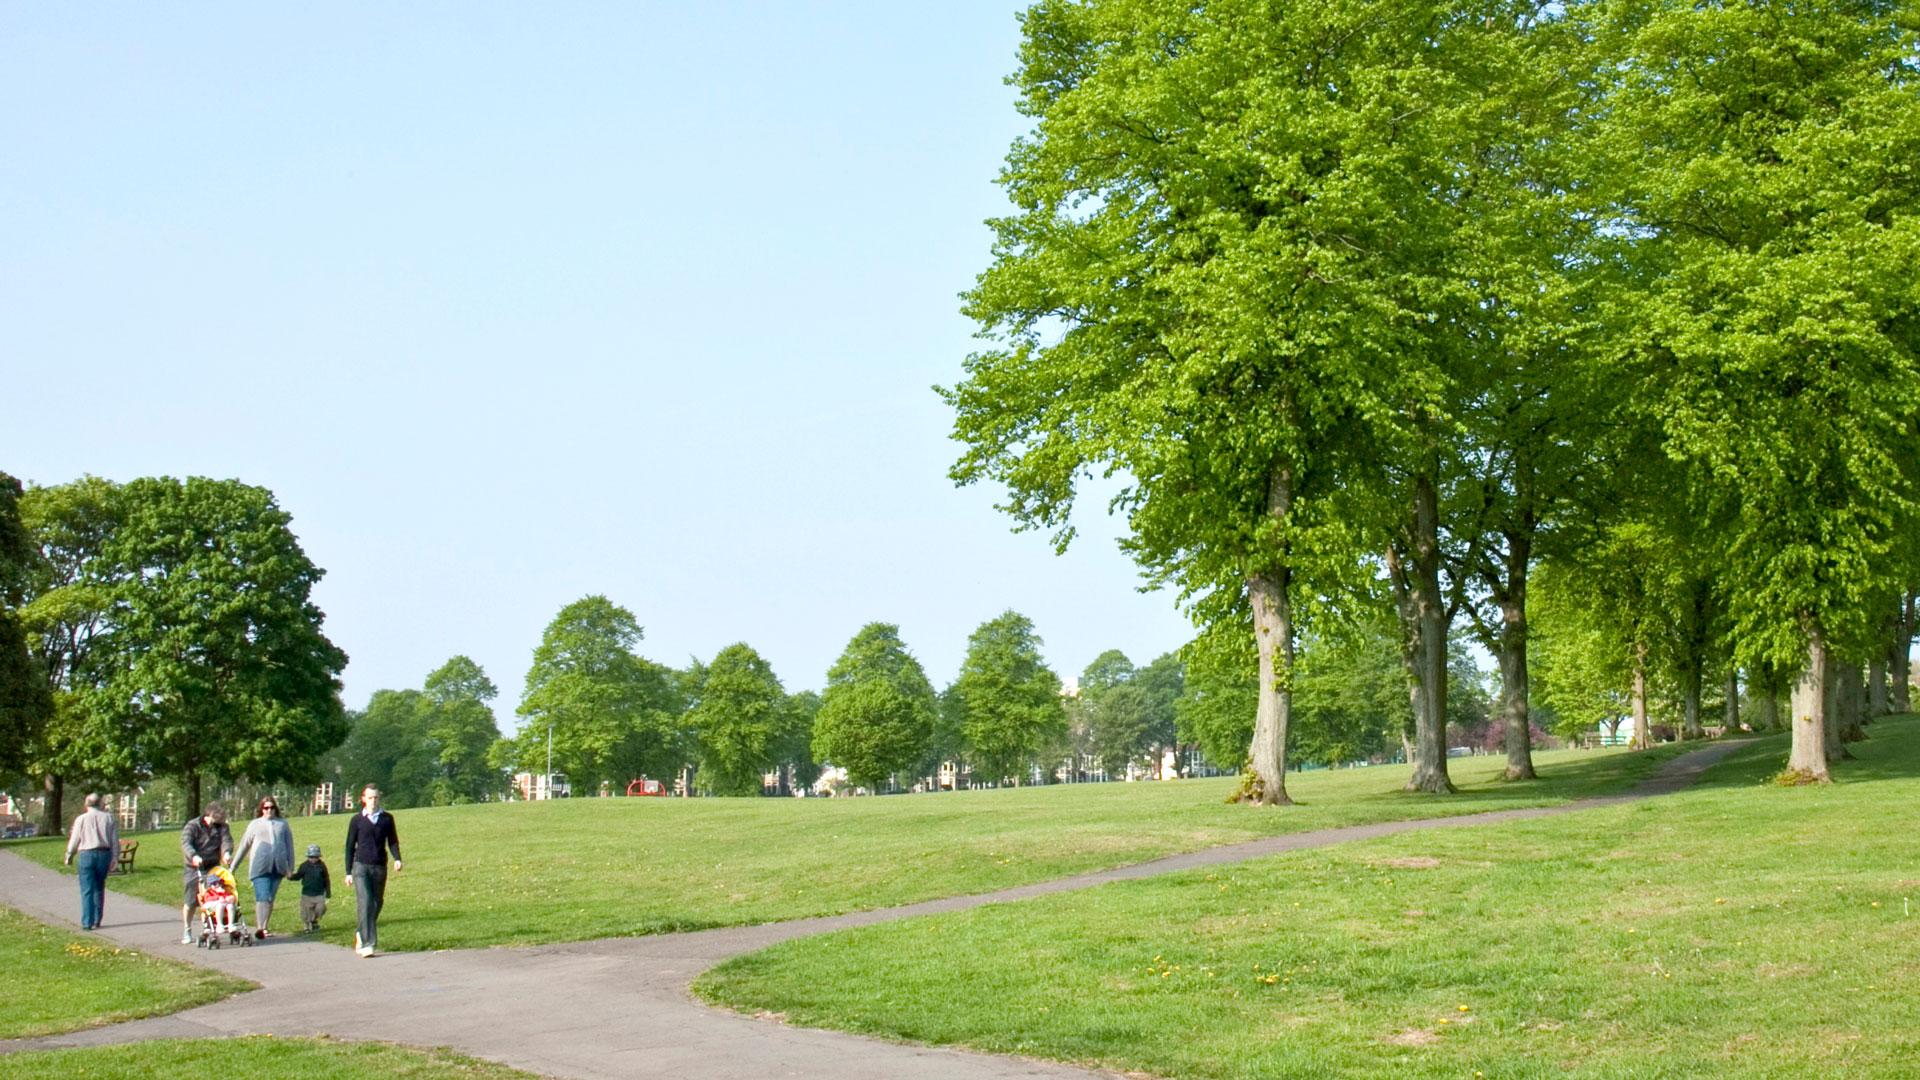 Image of a Bristol Park